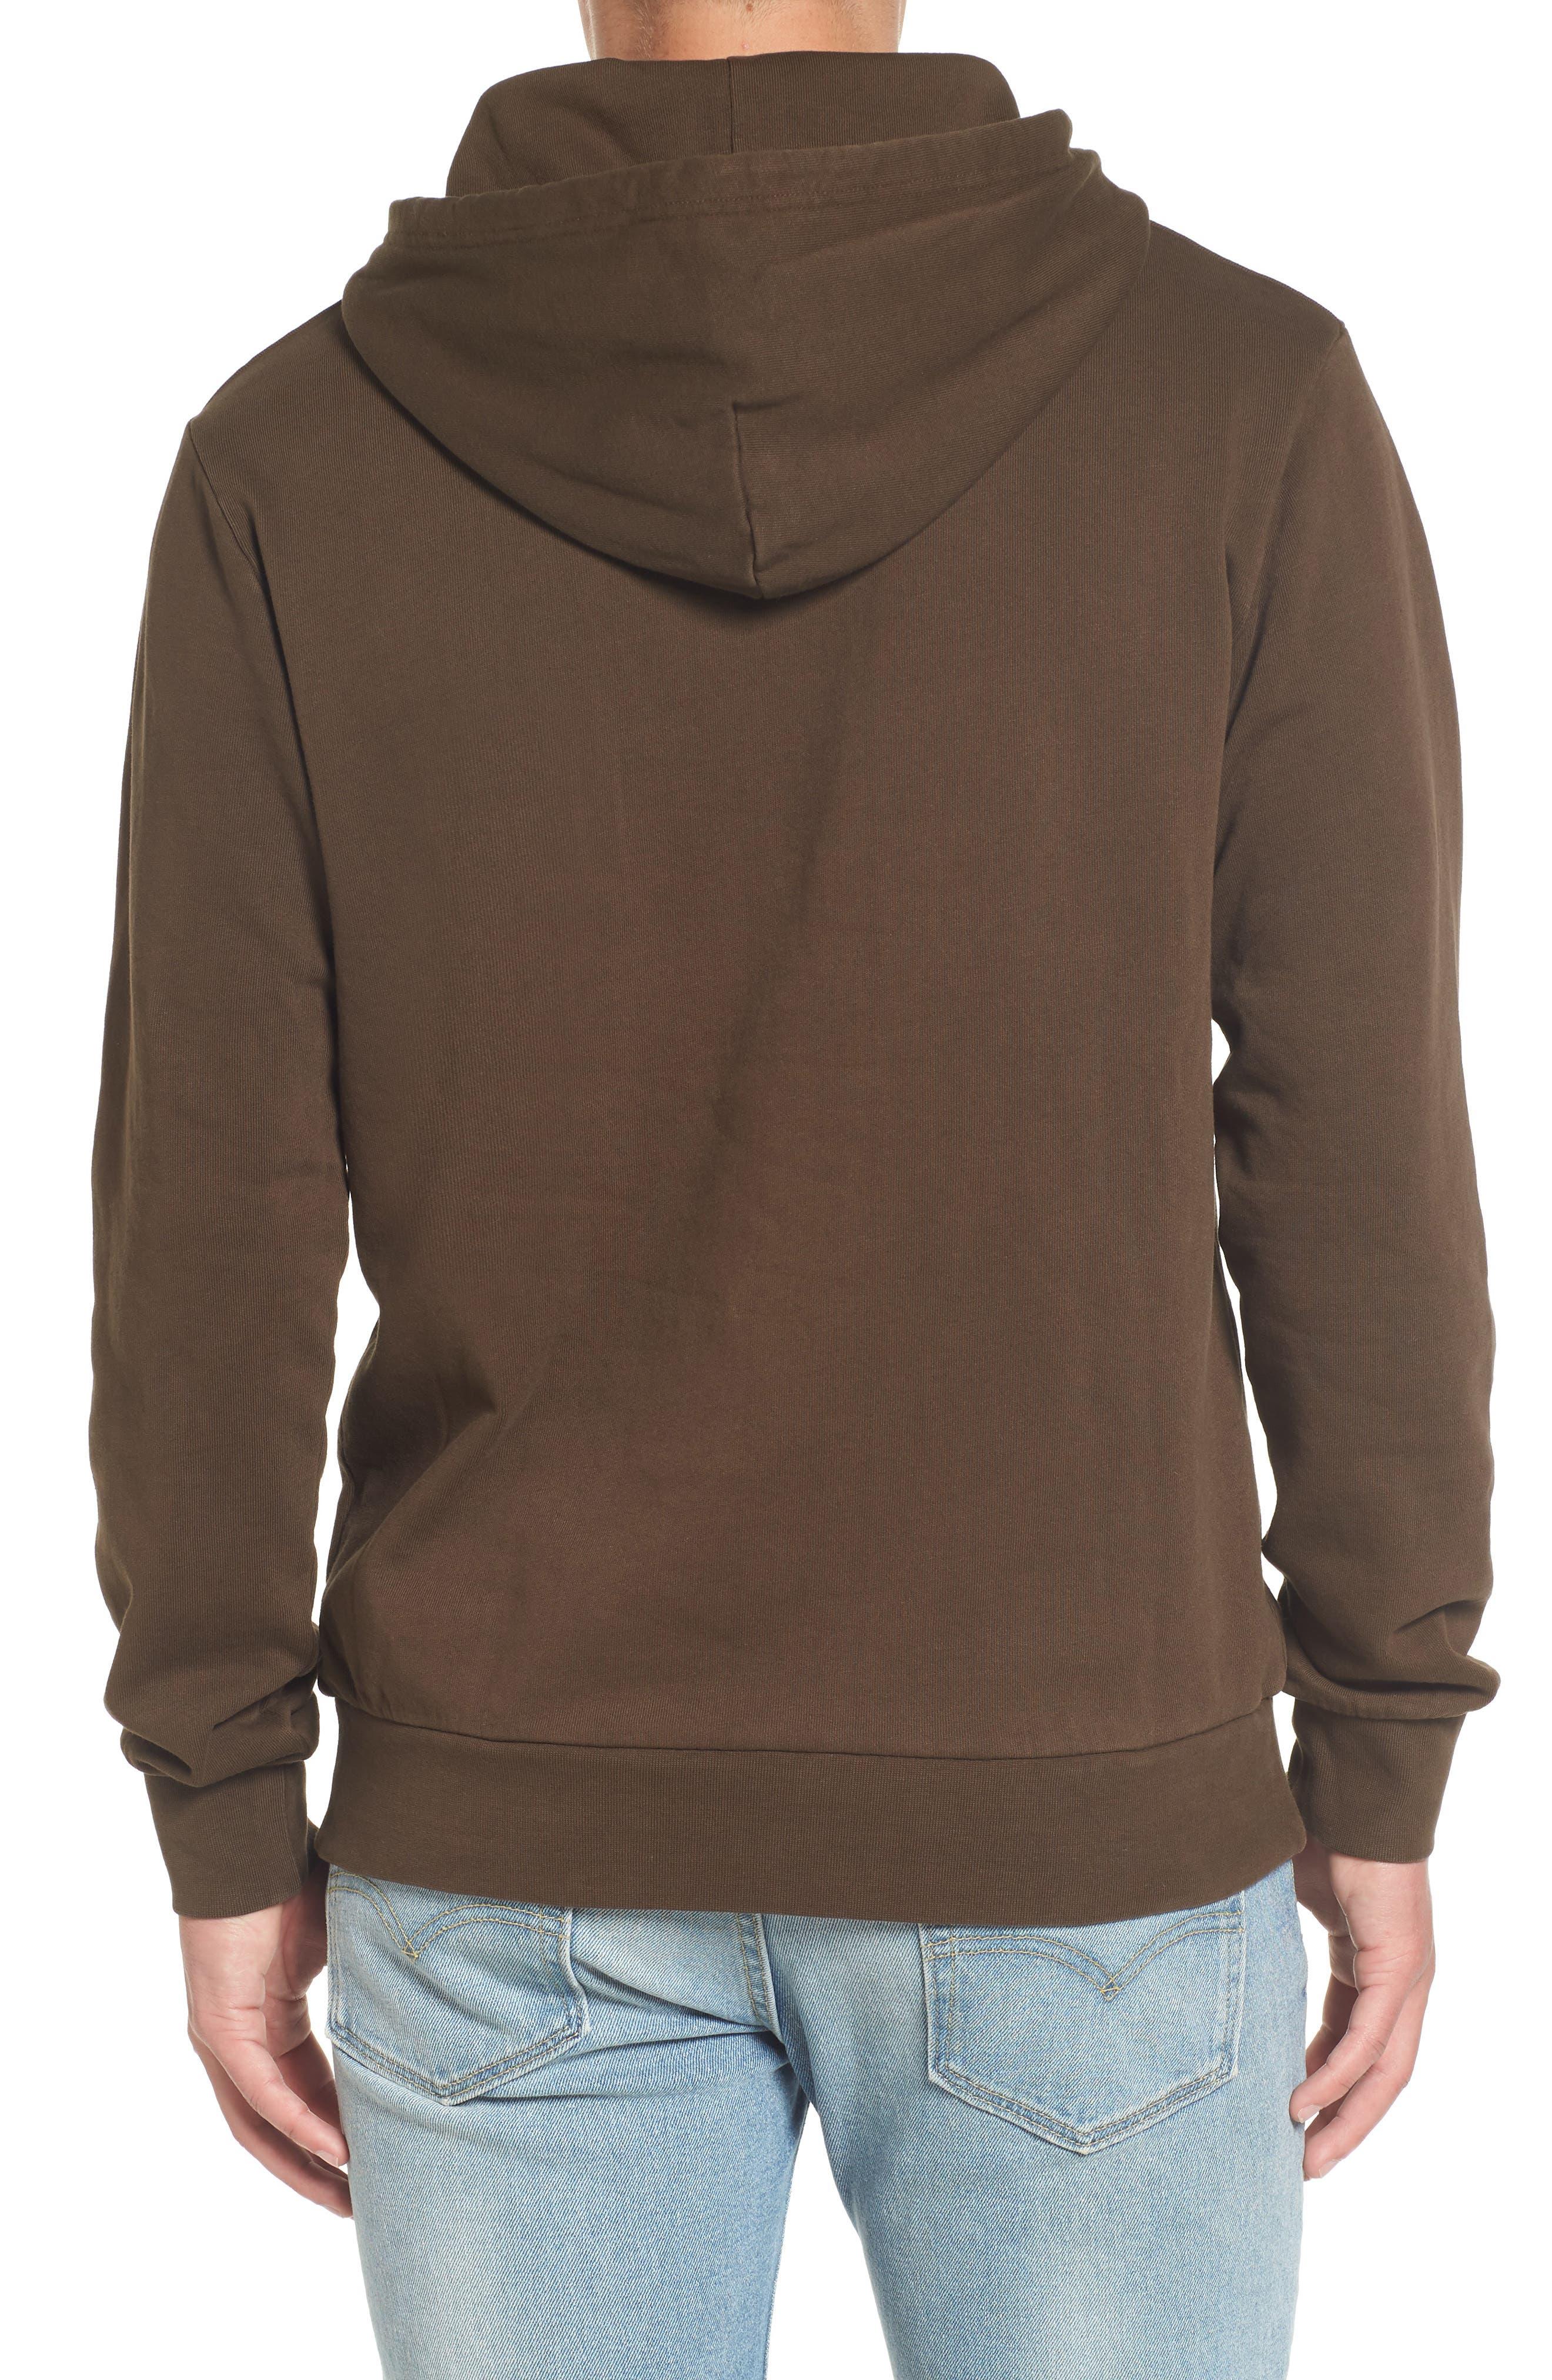 Hooded Fleece Sweatshirt,                             Alternate thumbnail 2, color,                             210